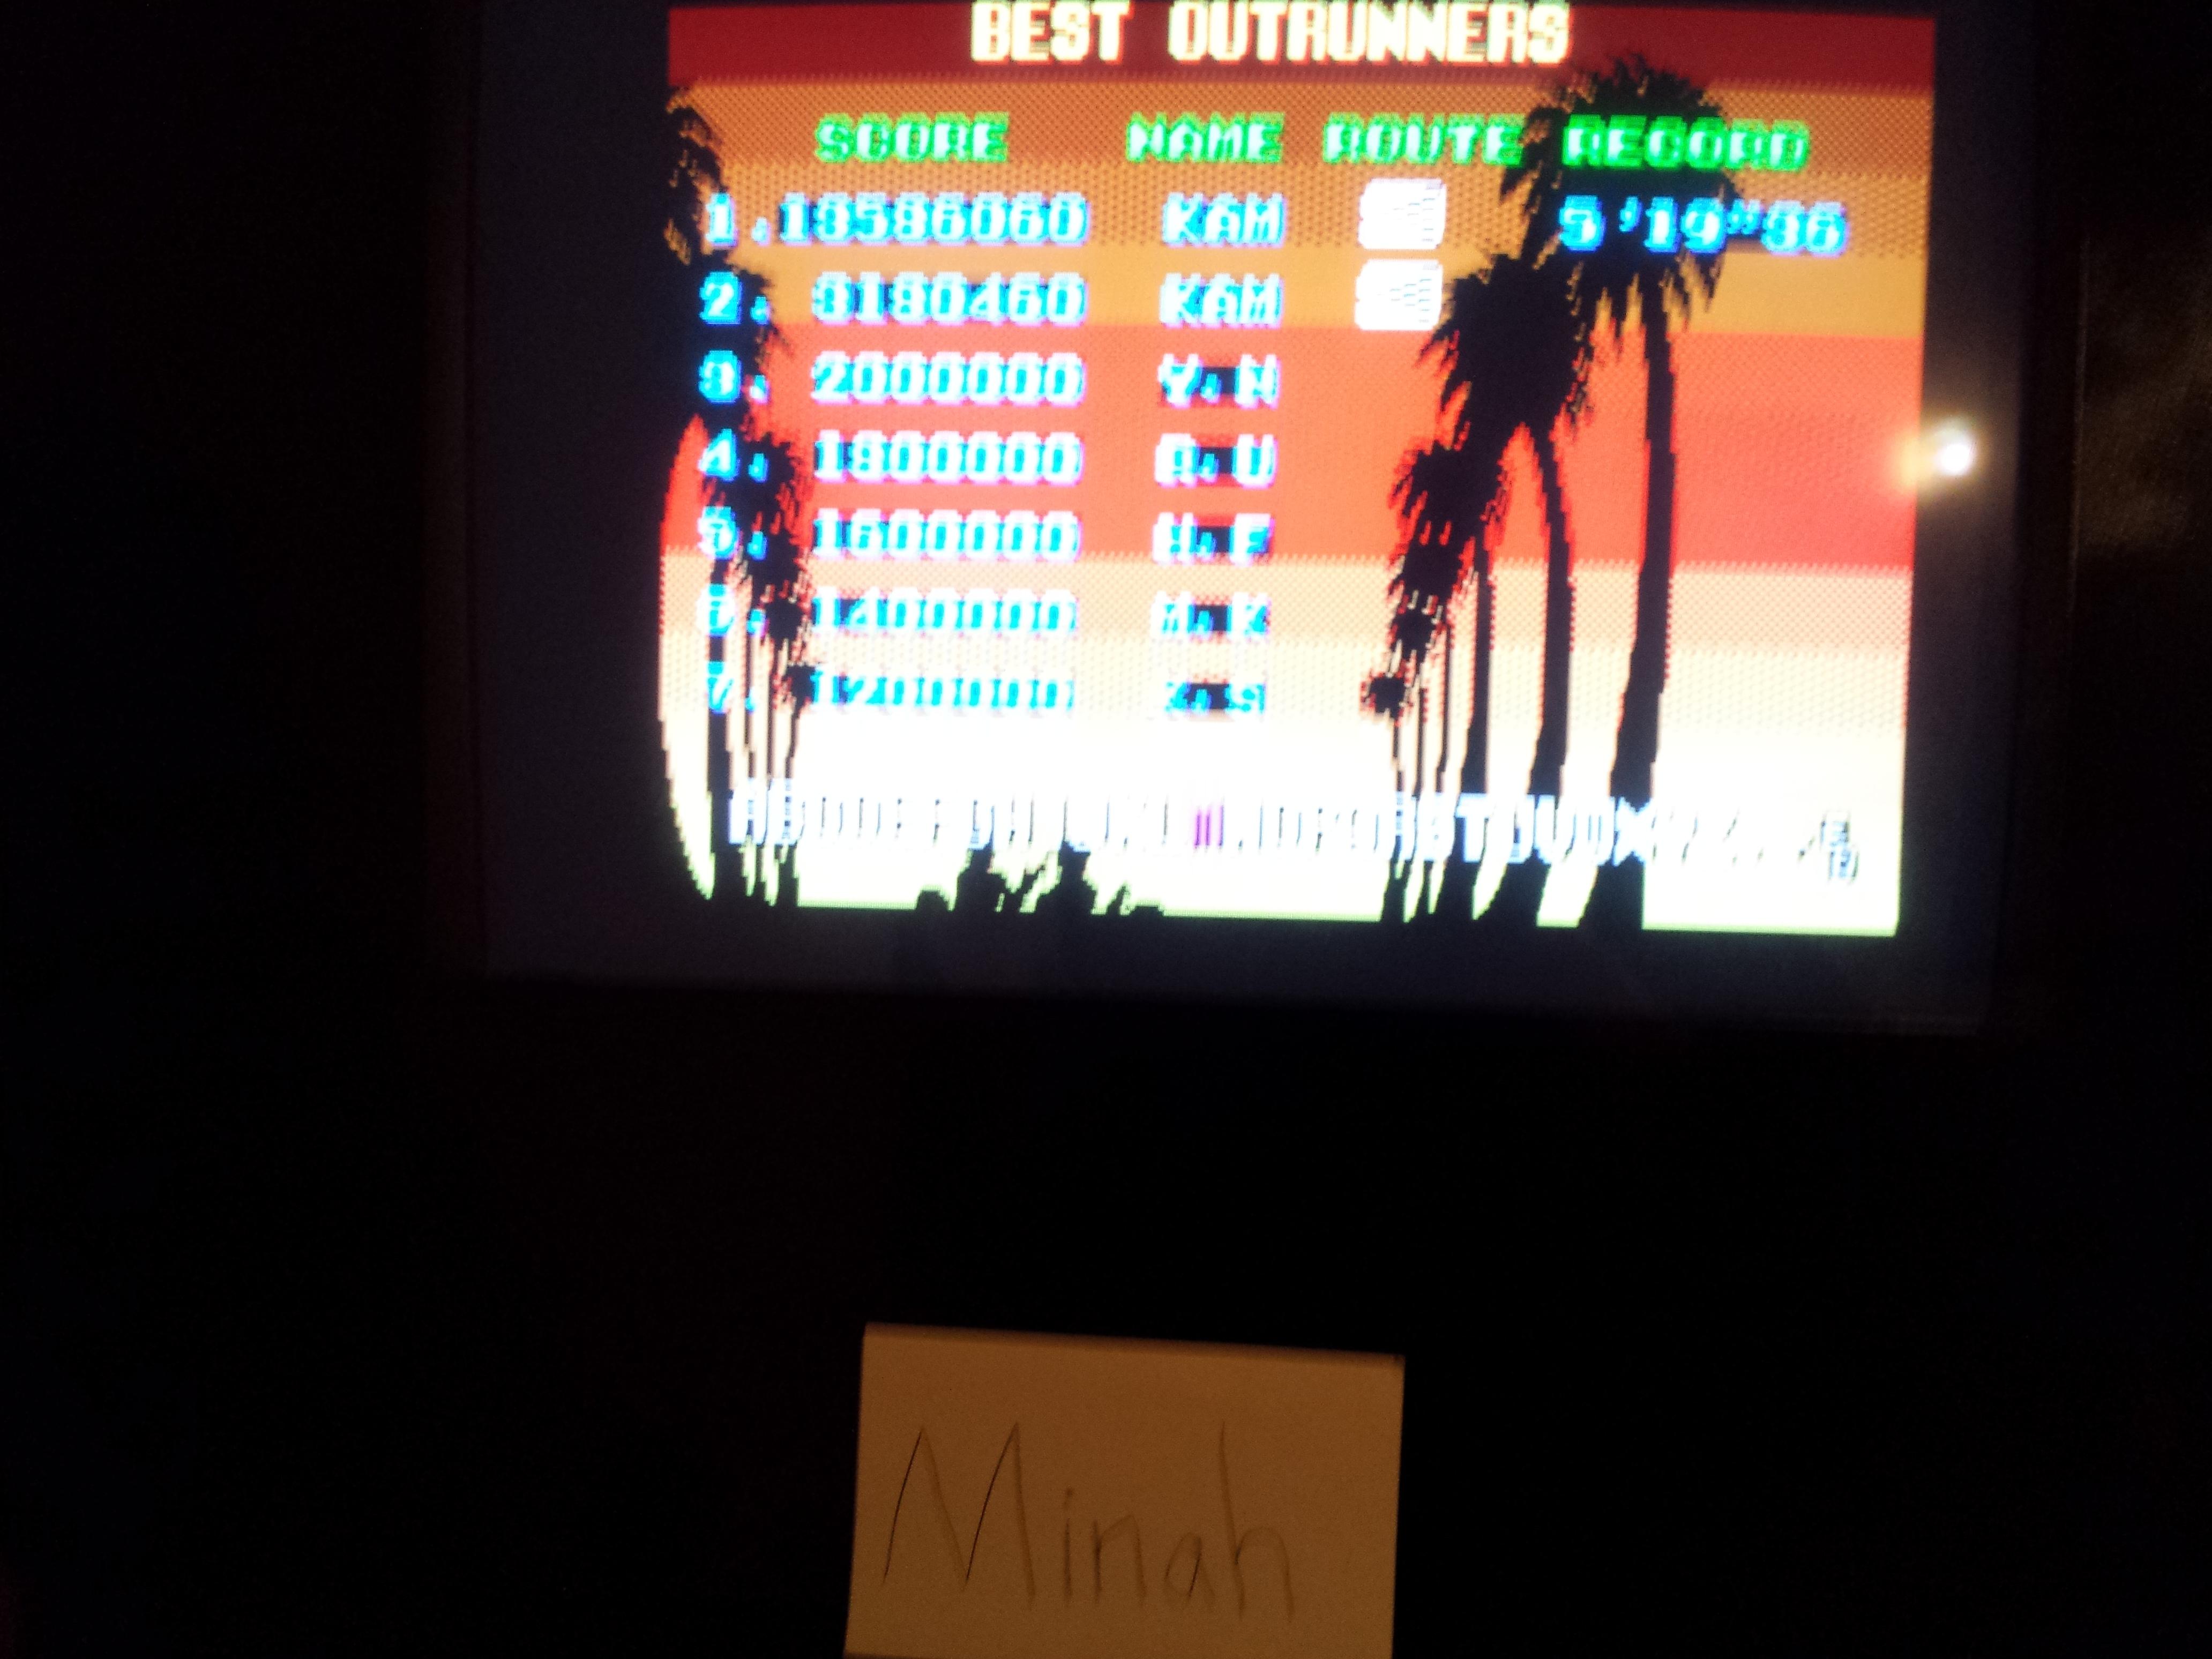 Outrun 13,586,060 points